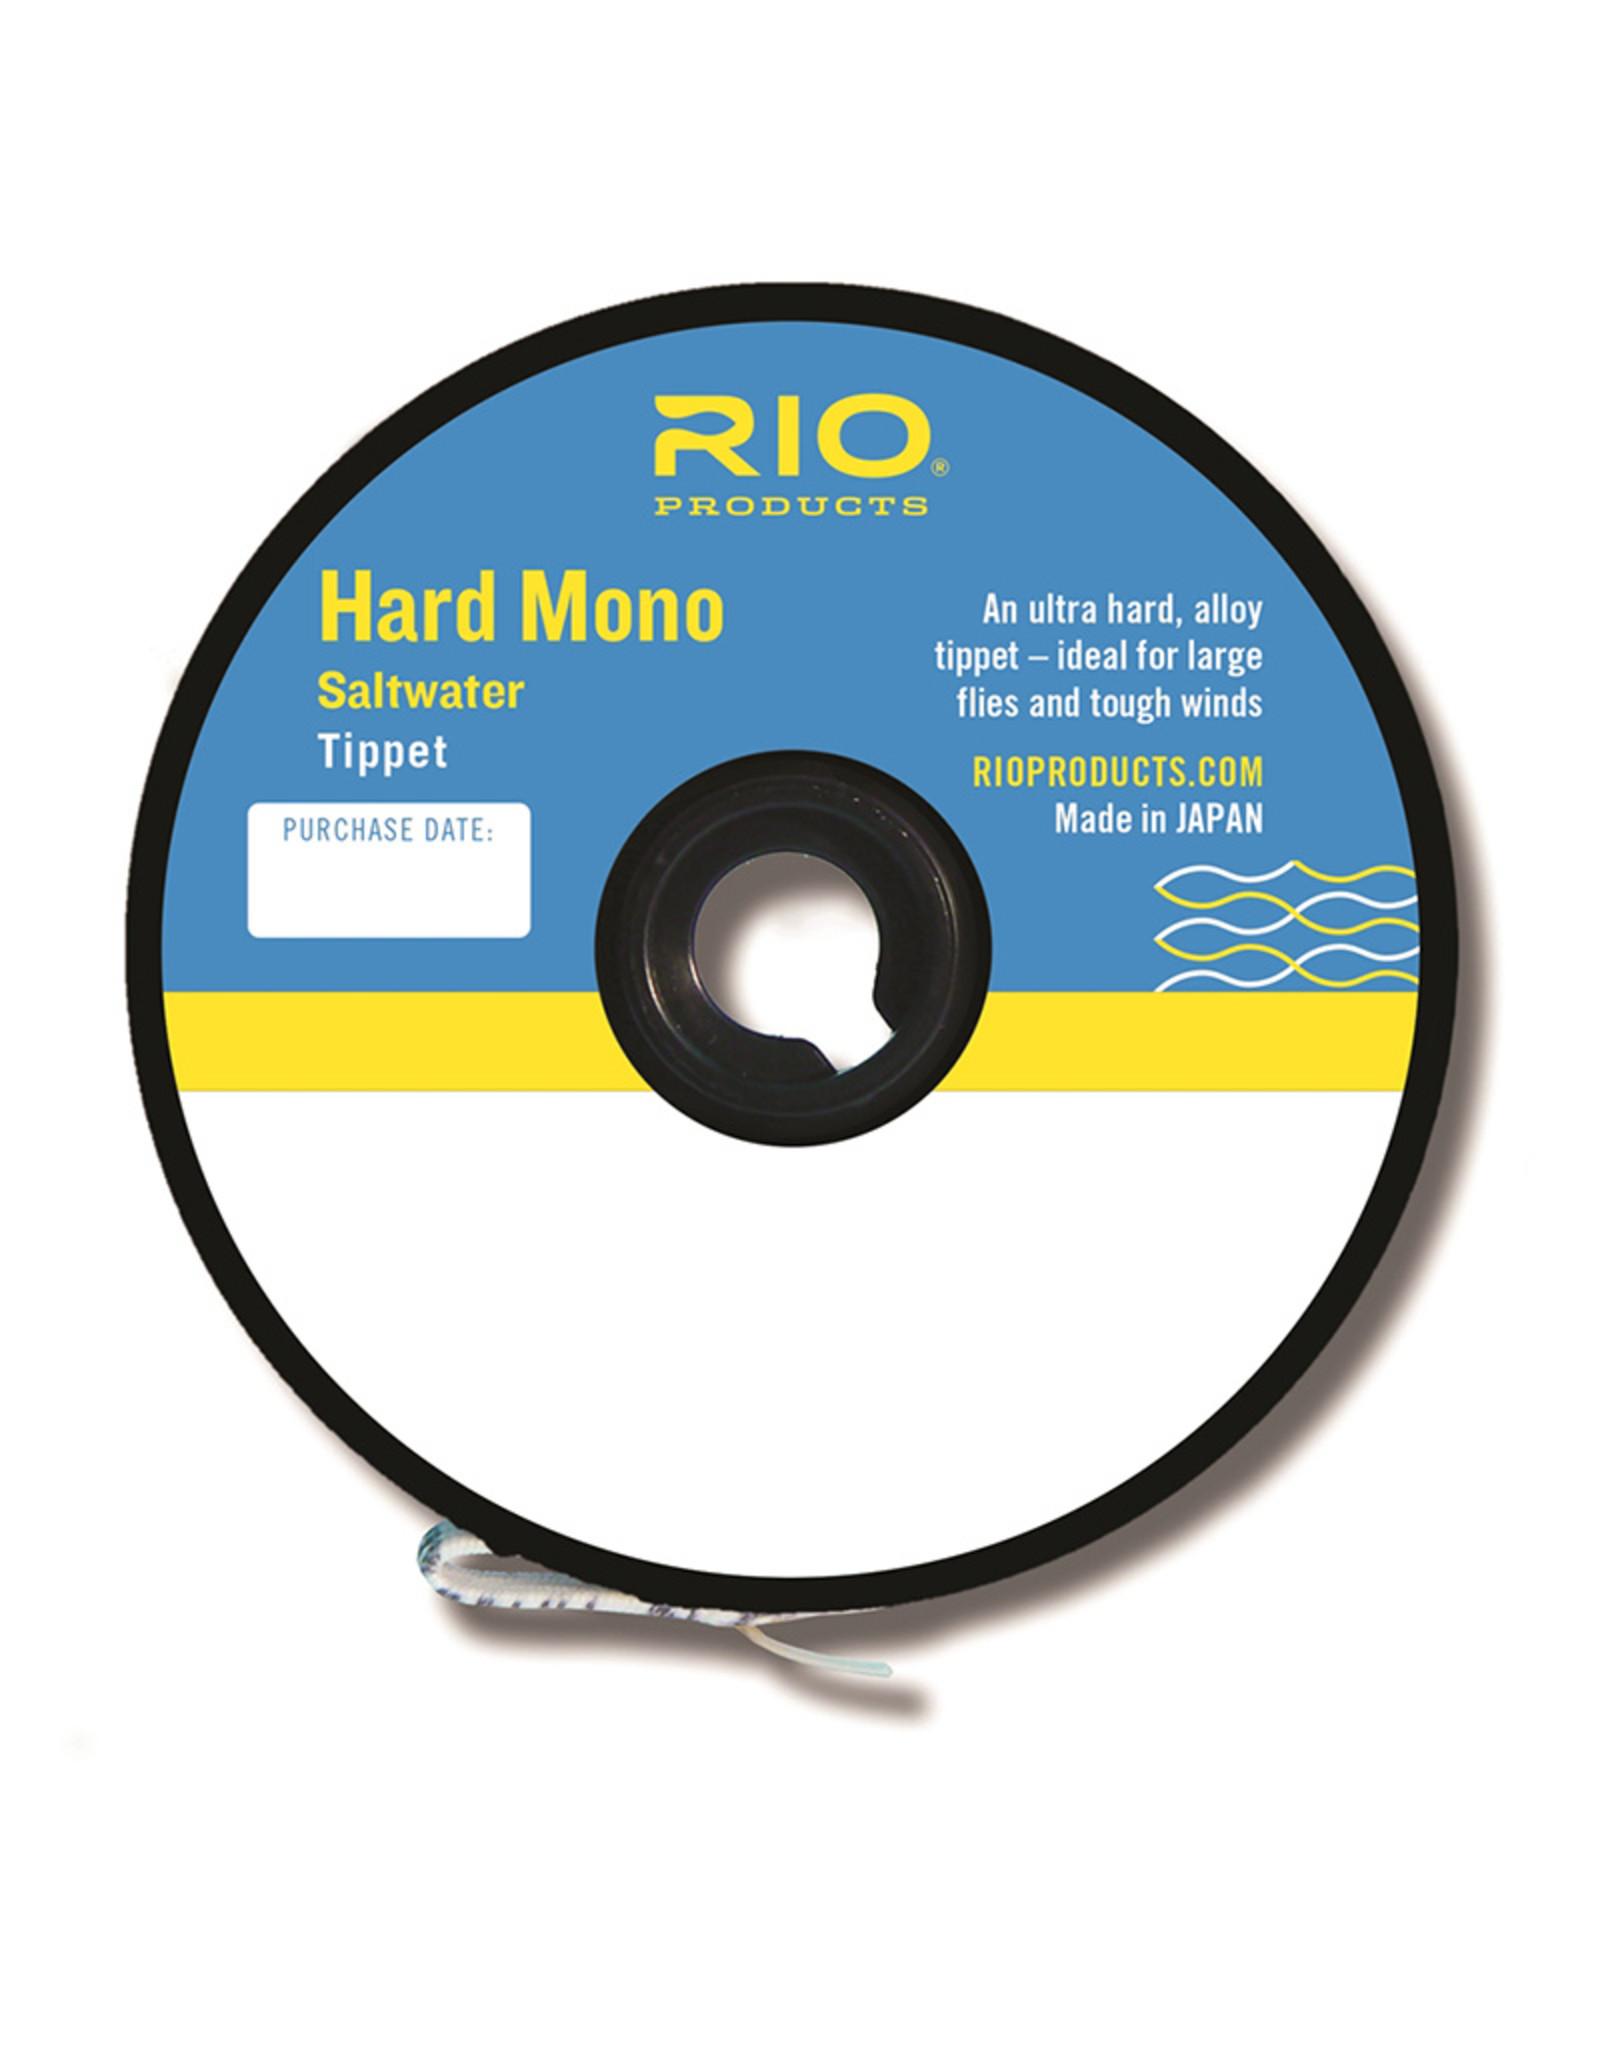 RIO Products Hard Mono/Saltwater